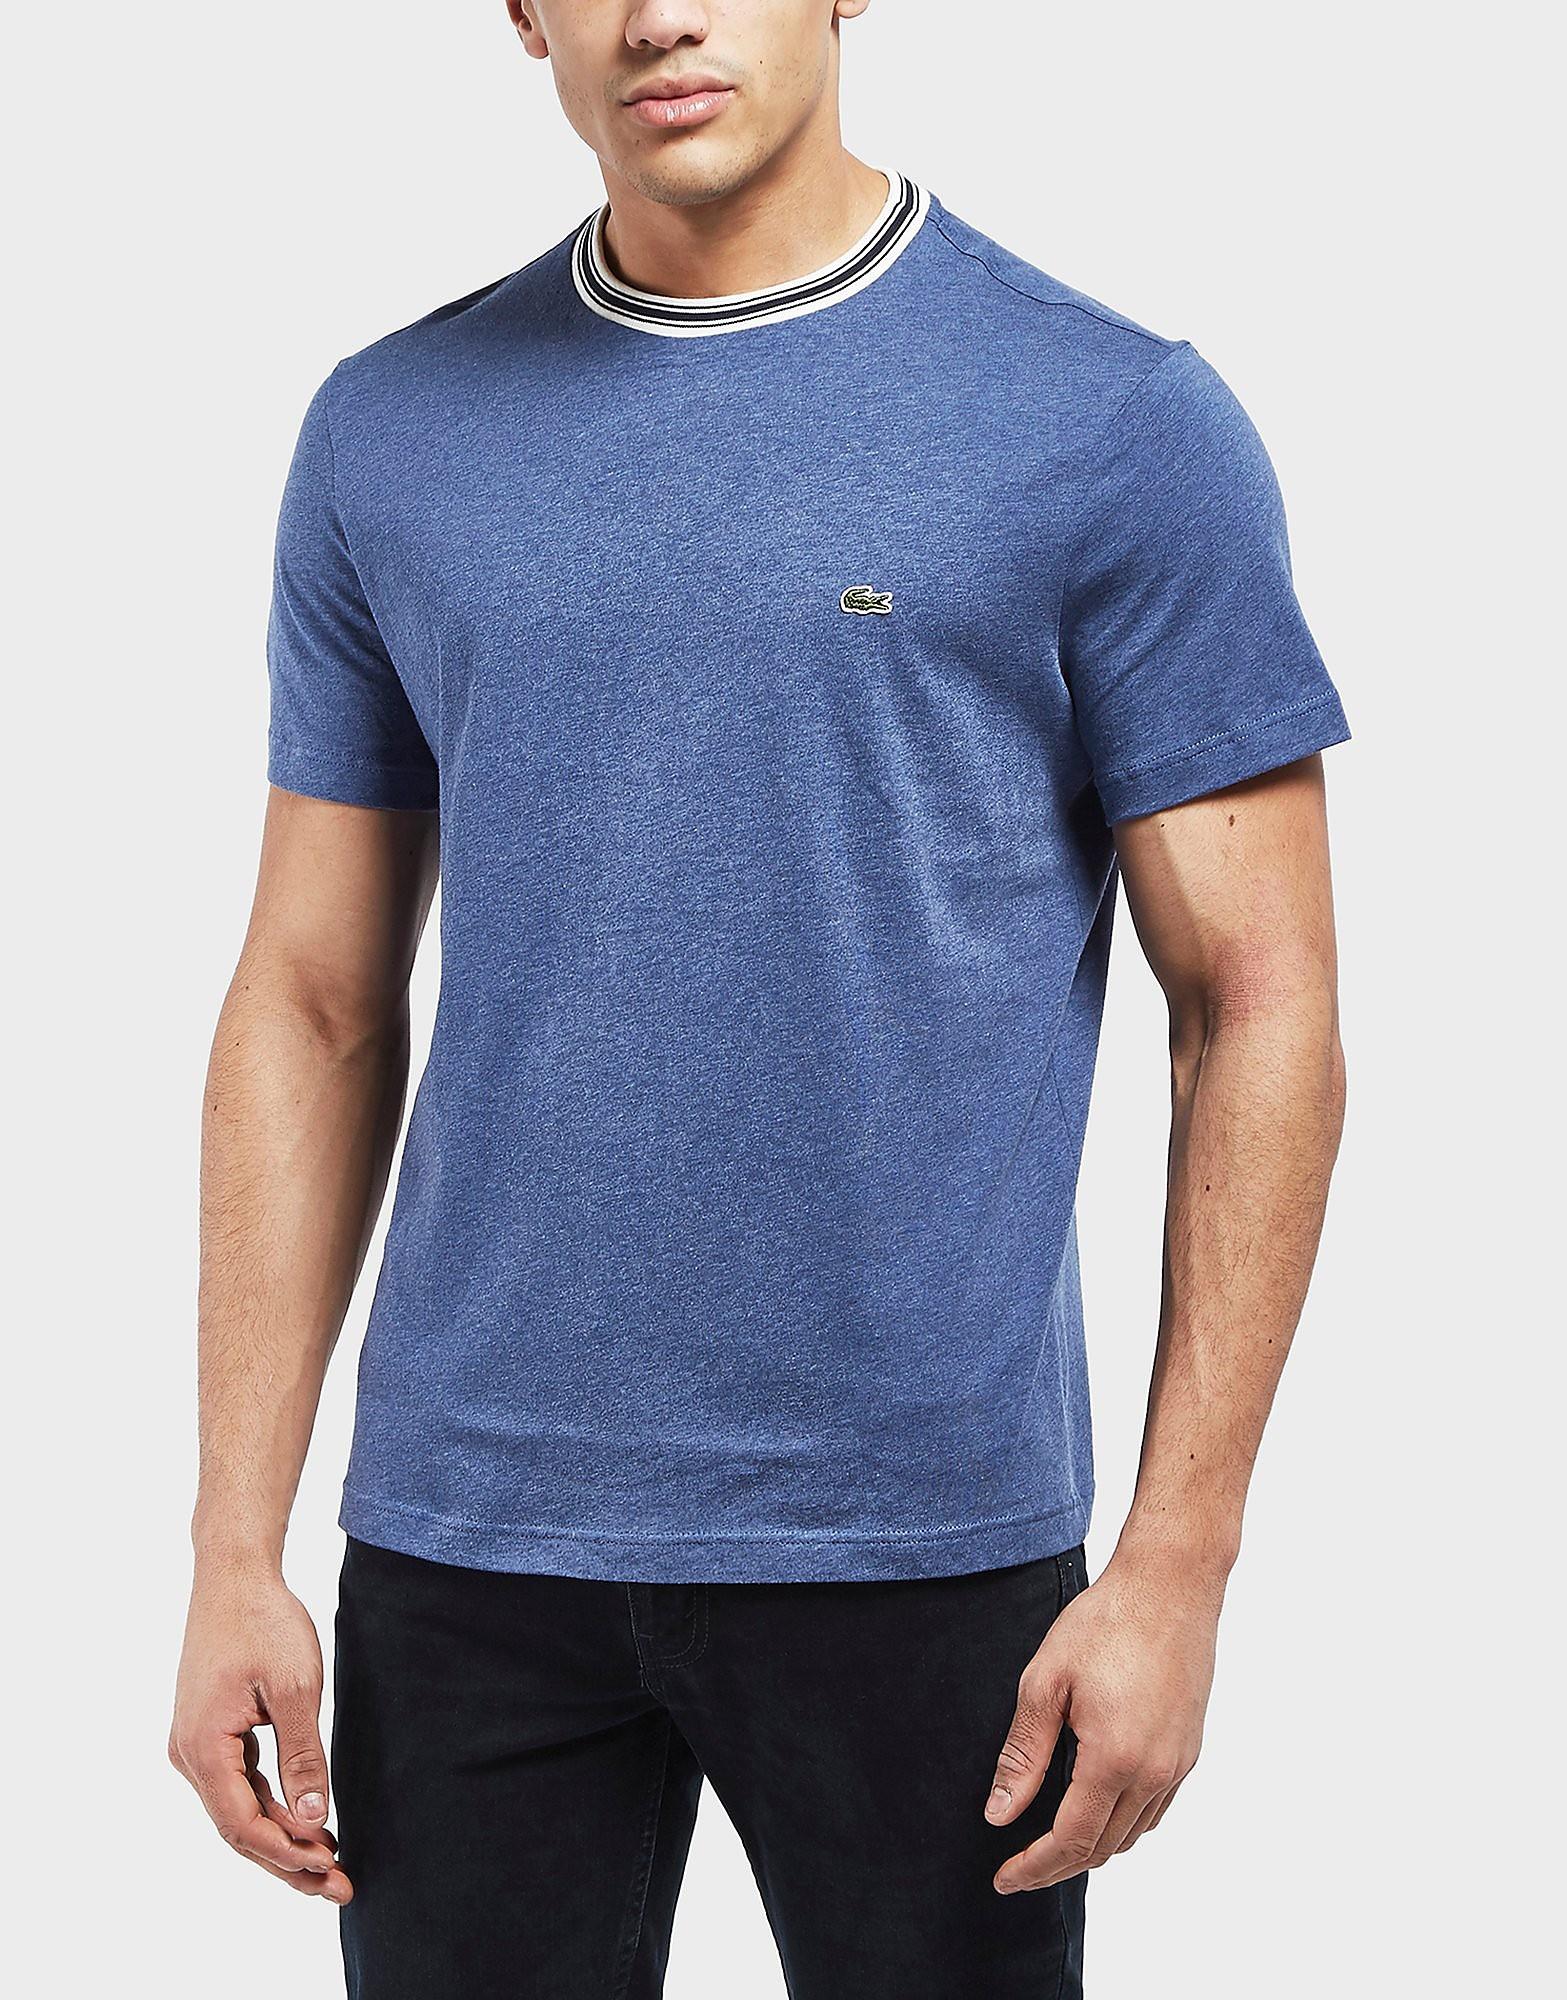 Lacoste Tipped Ringer Short Sleeve T-Shirt